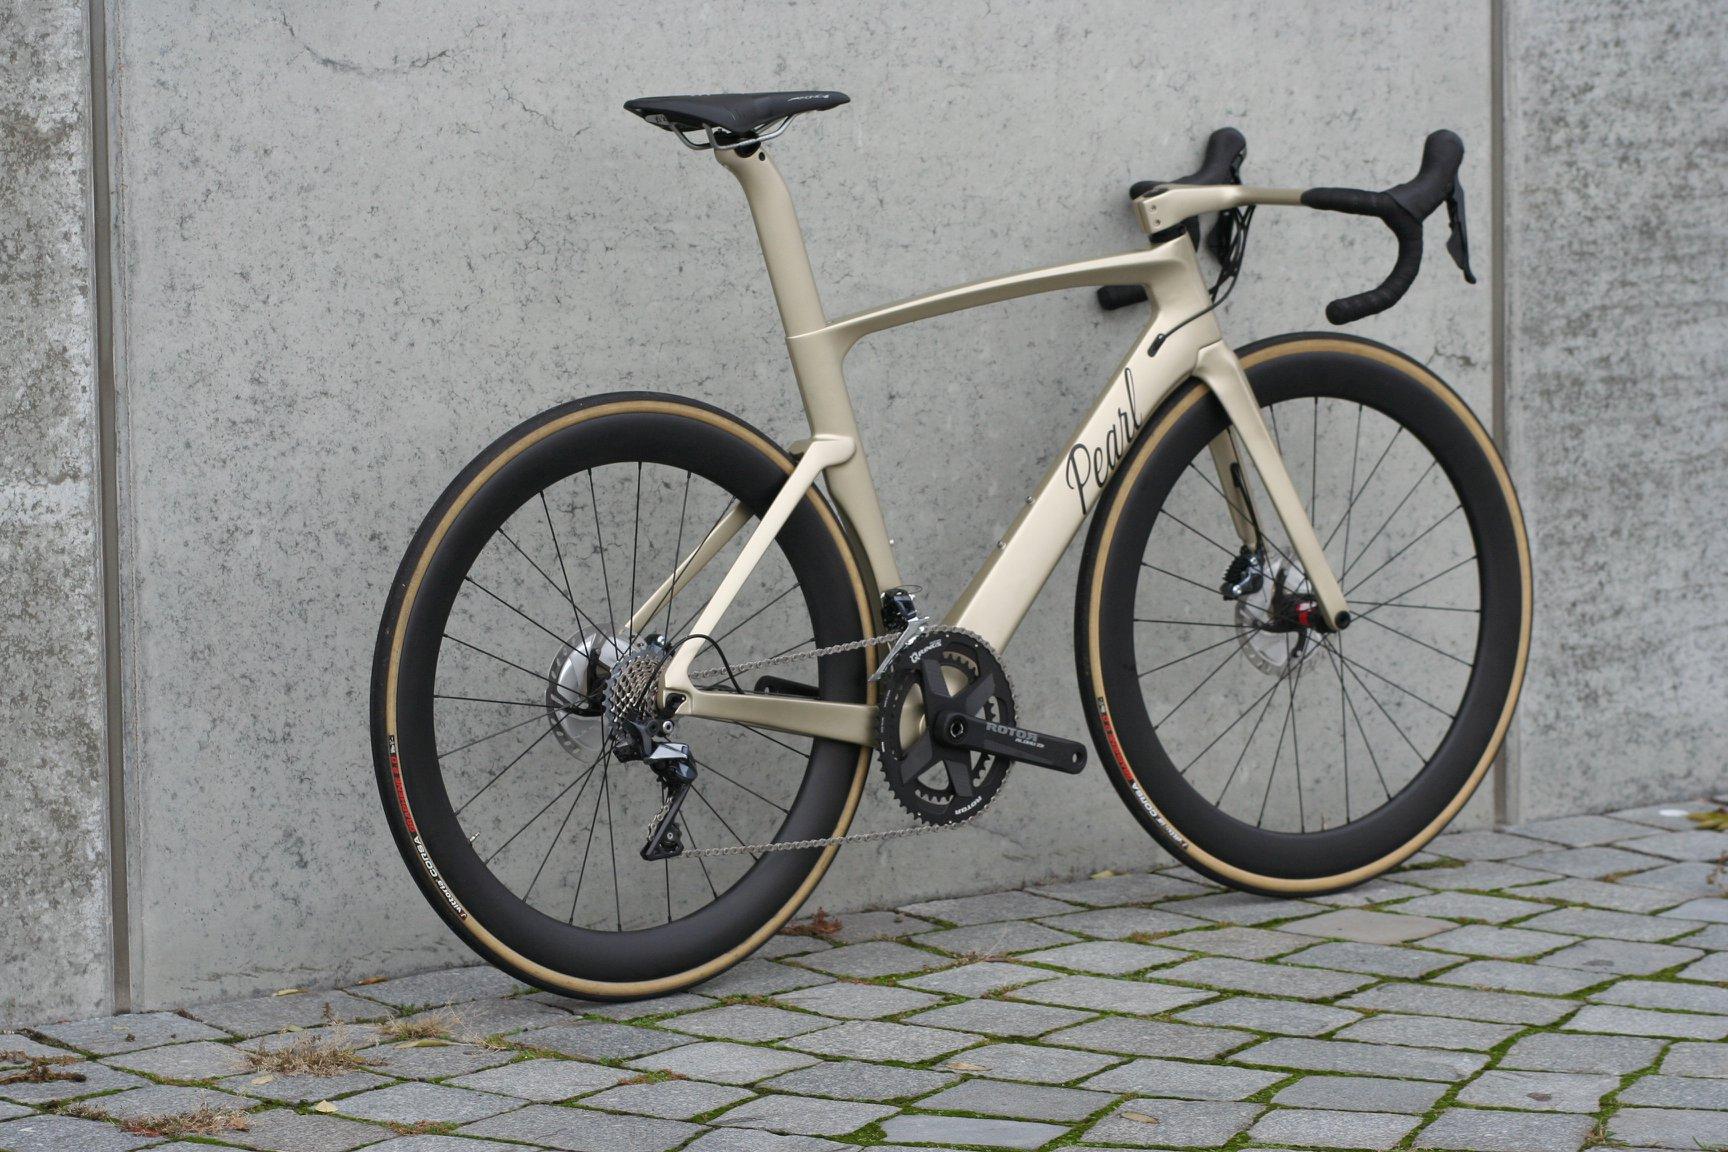 Custom Dice Aero in Matt Gold mit Wishbone Lenker. Gewicht 7,5kg